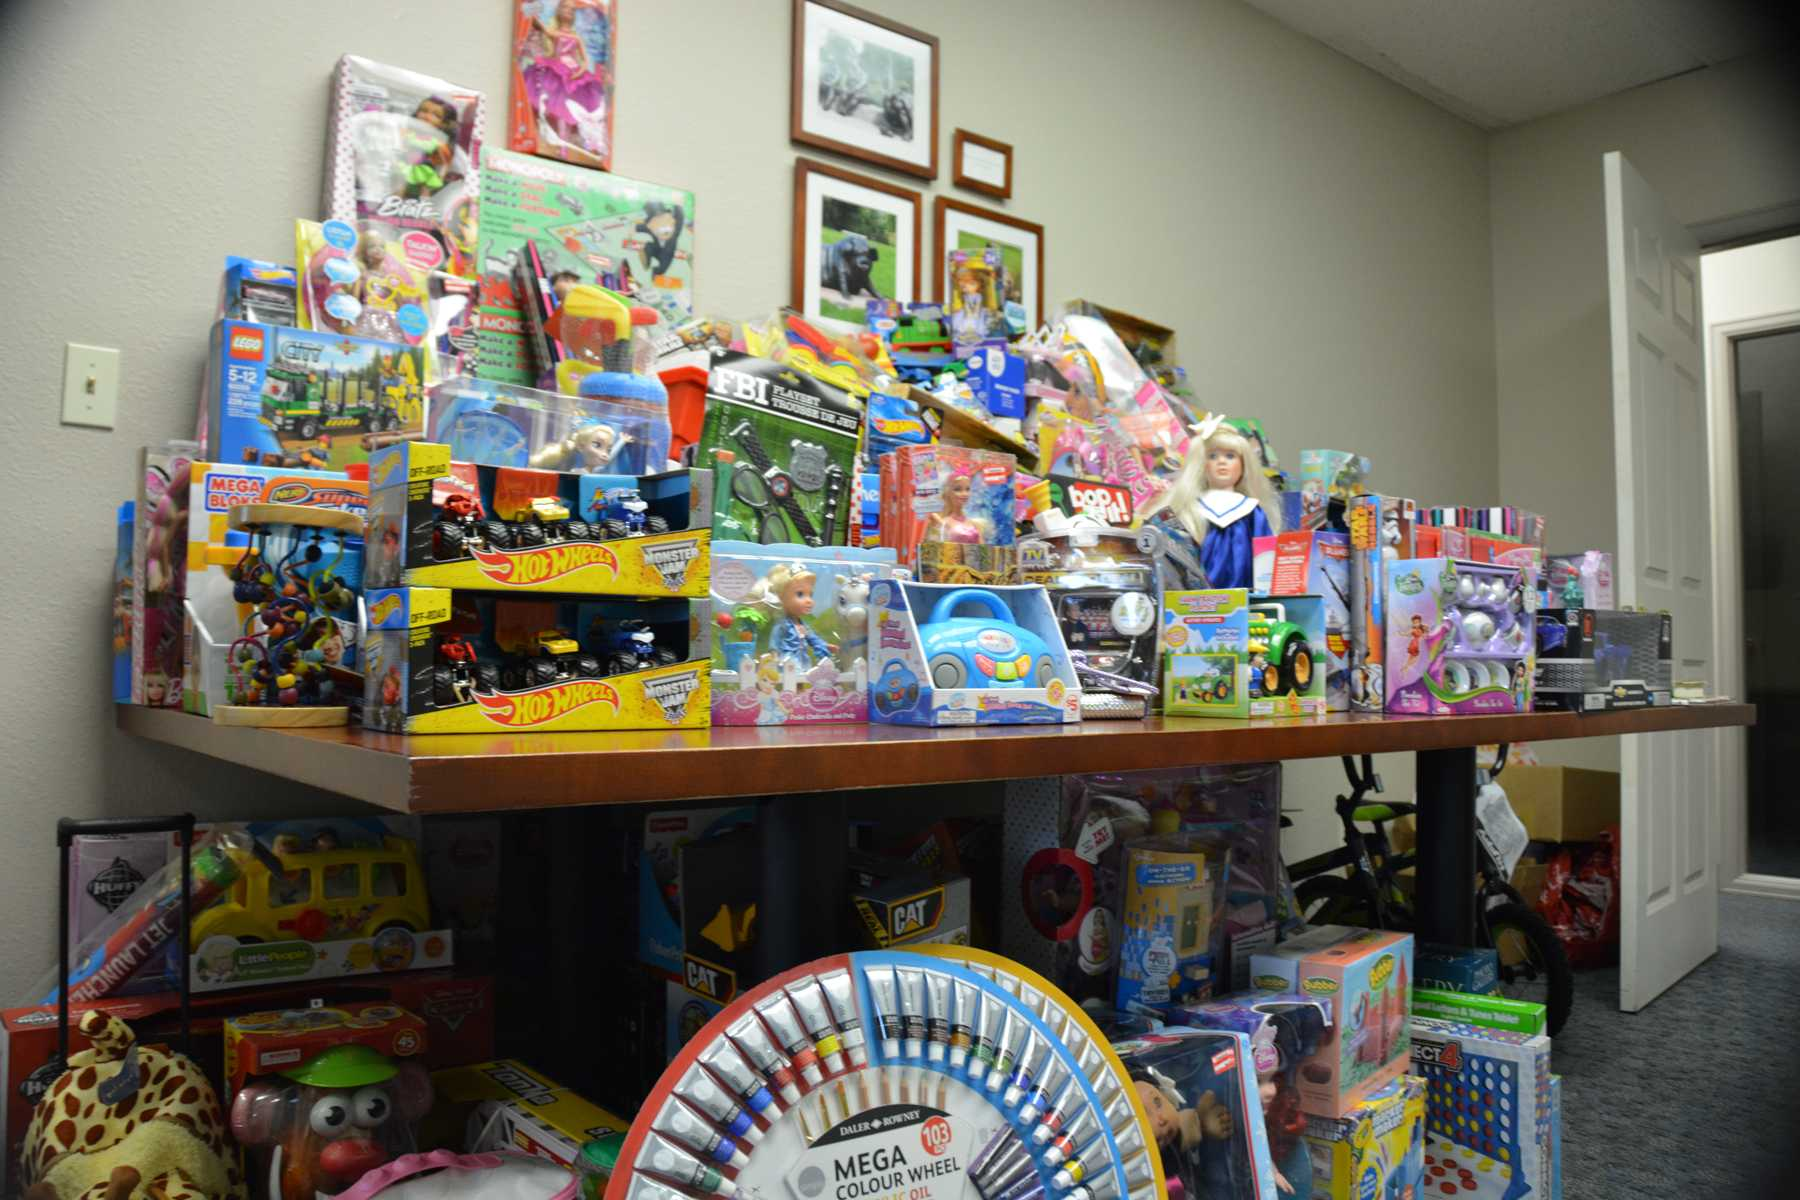 Santa Cops of Larimer County provide holiday gifts to